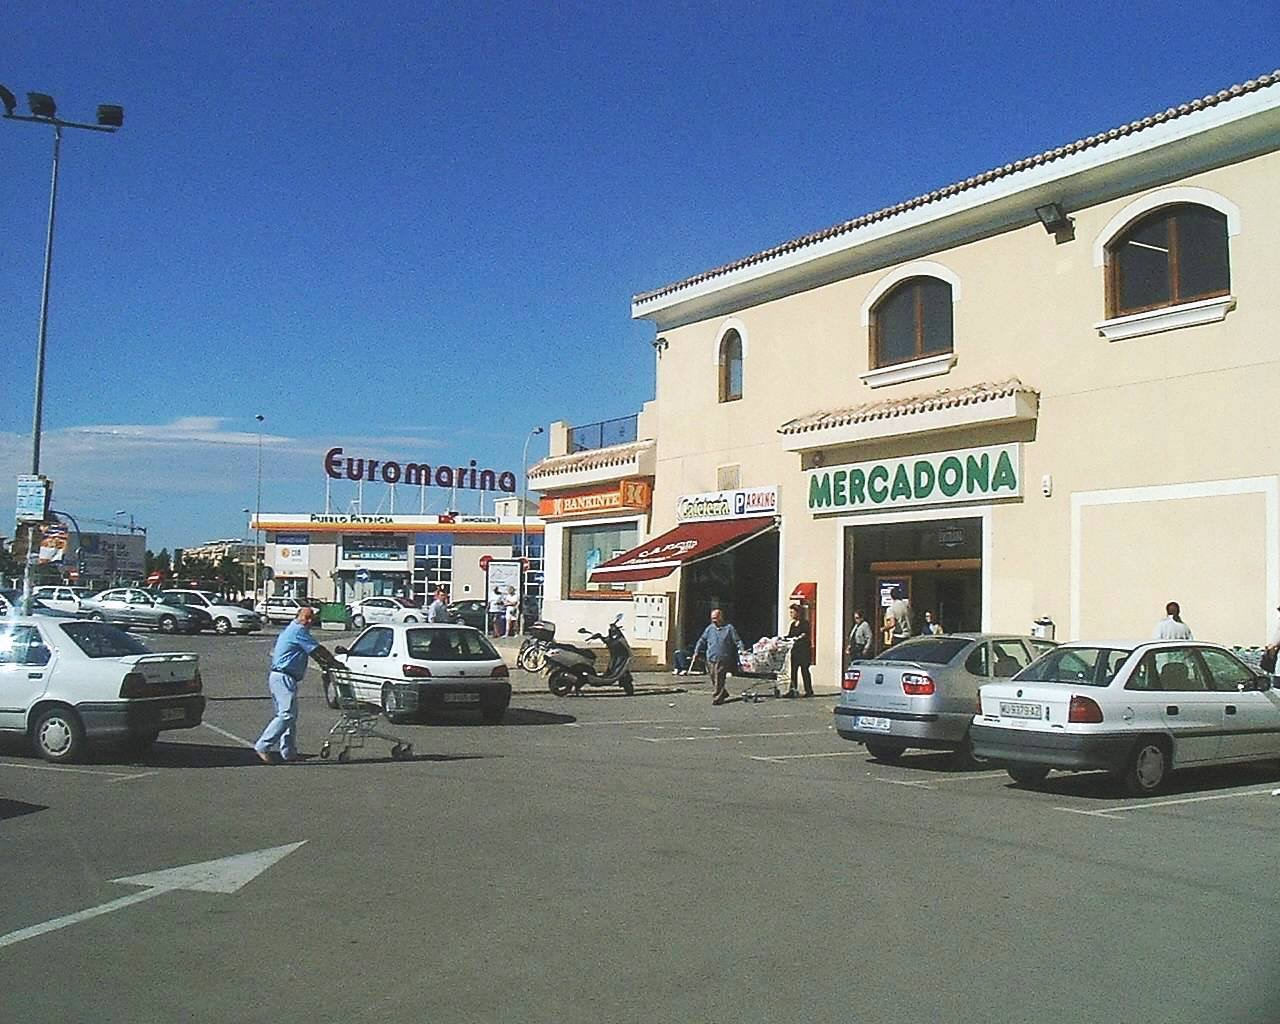 Mercadona & parking!